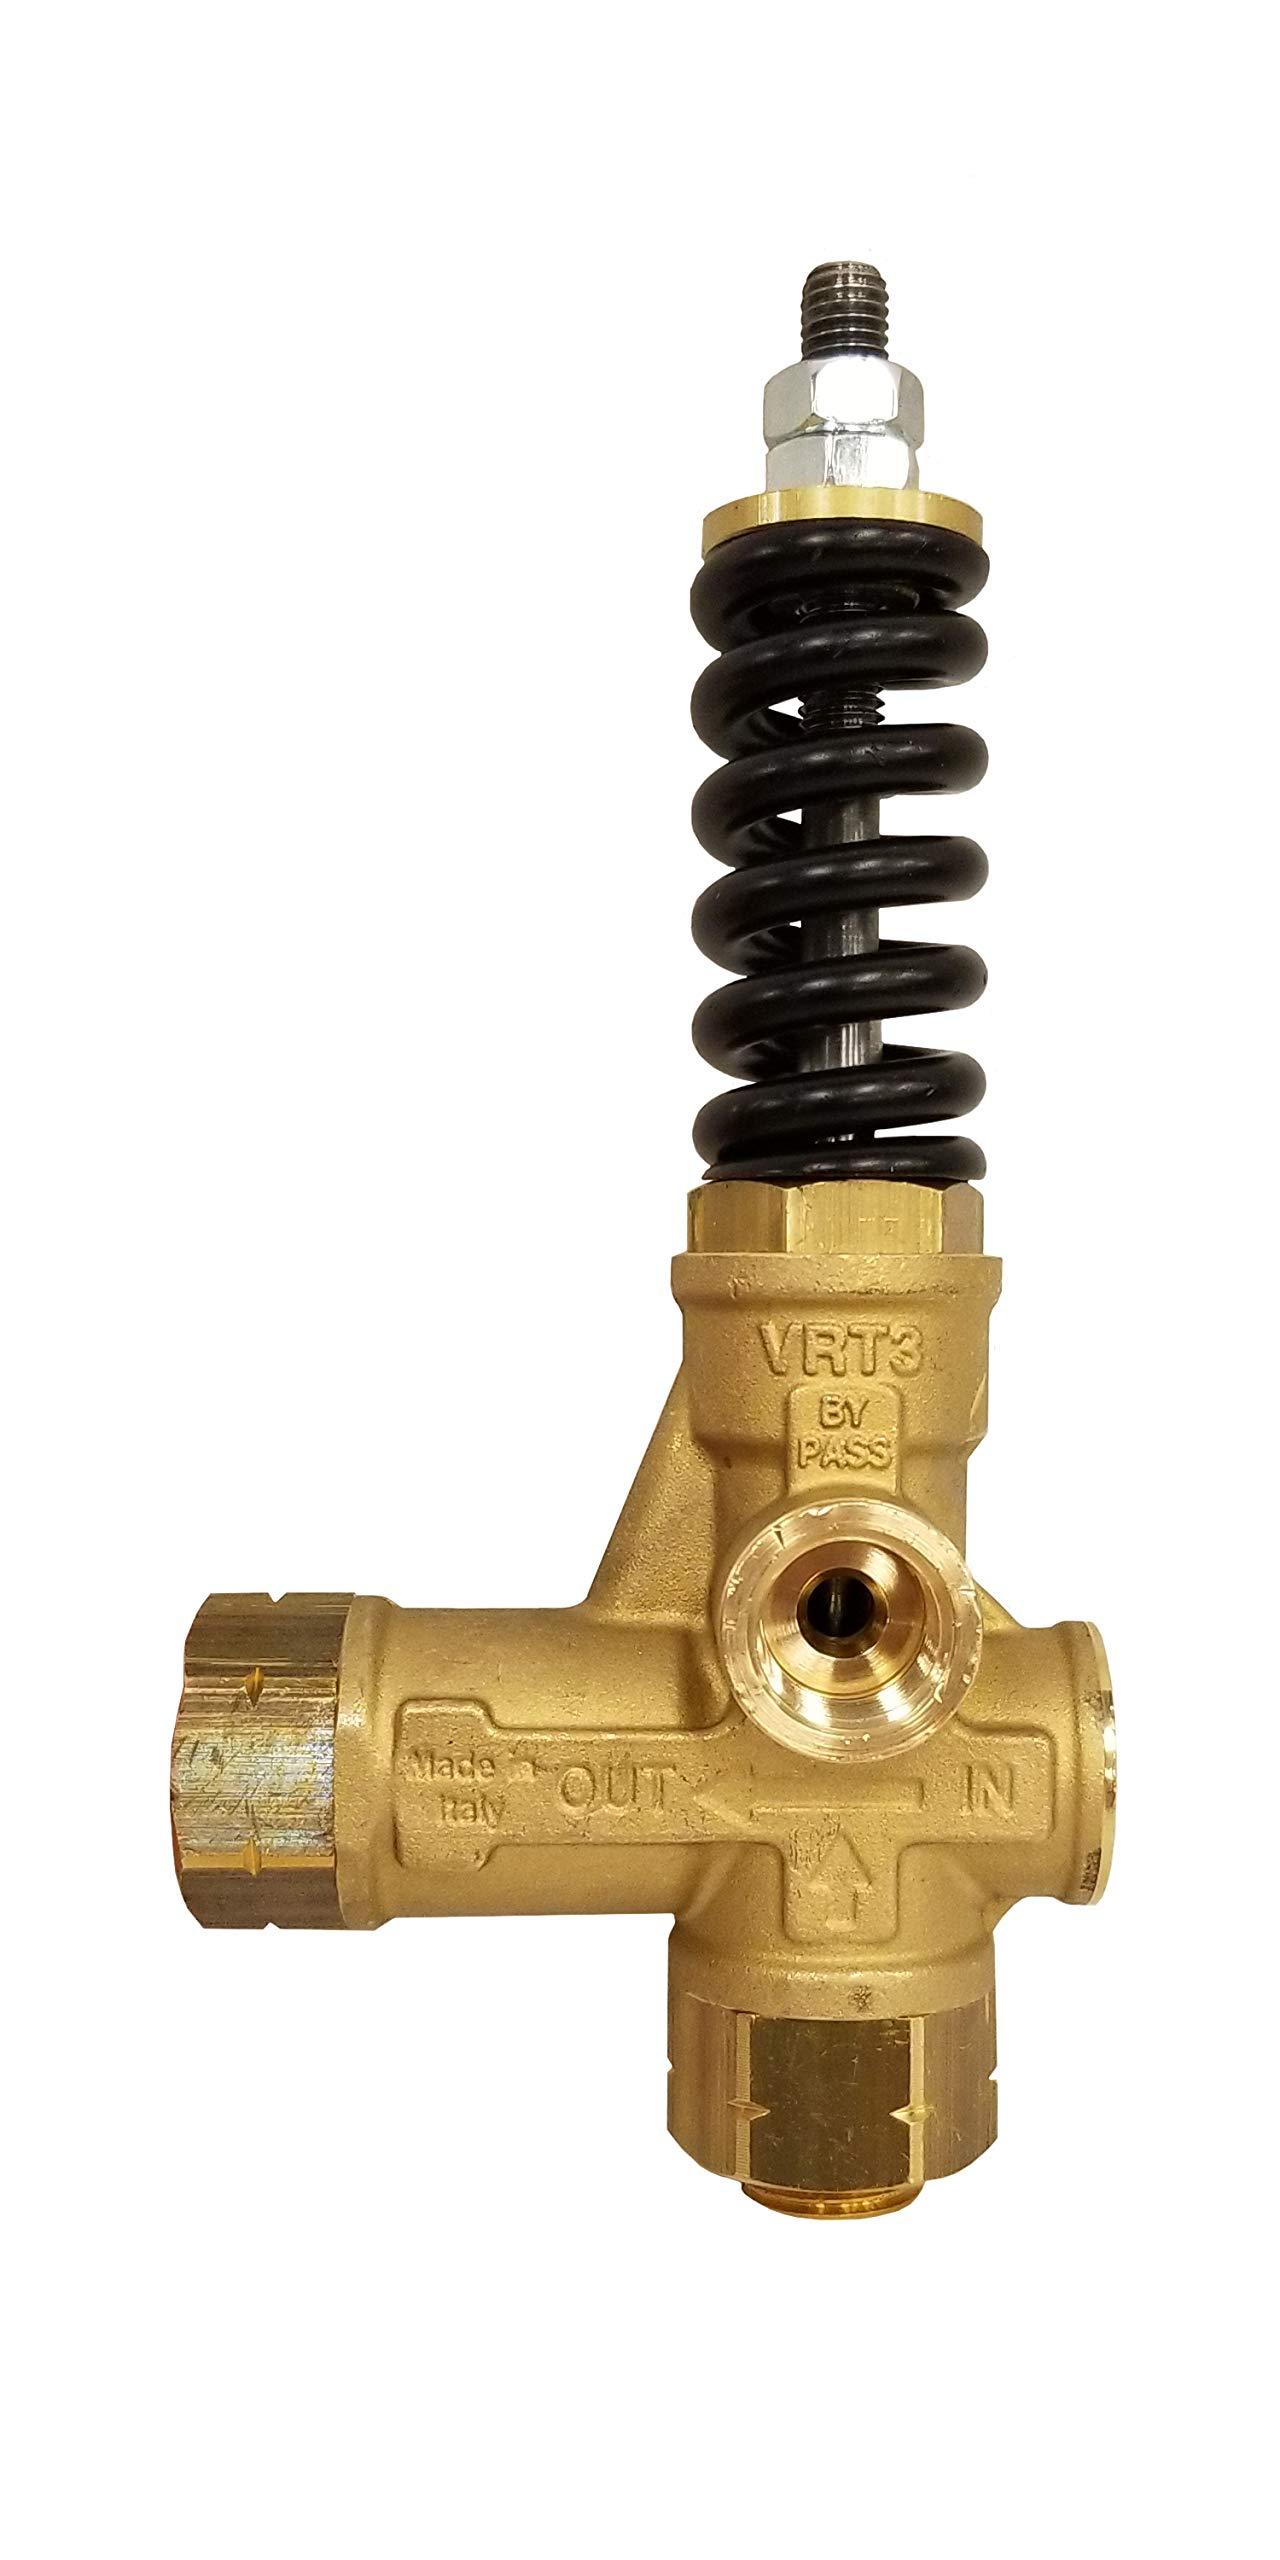 AR Annovi Reverberi VRT3-310A Pressure Washer Unloader, Black, 4500 PSI, No Knob, Brass